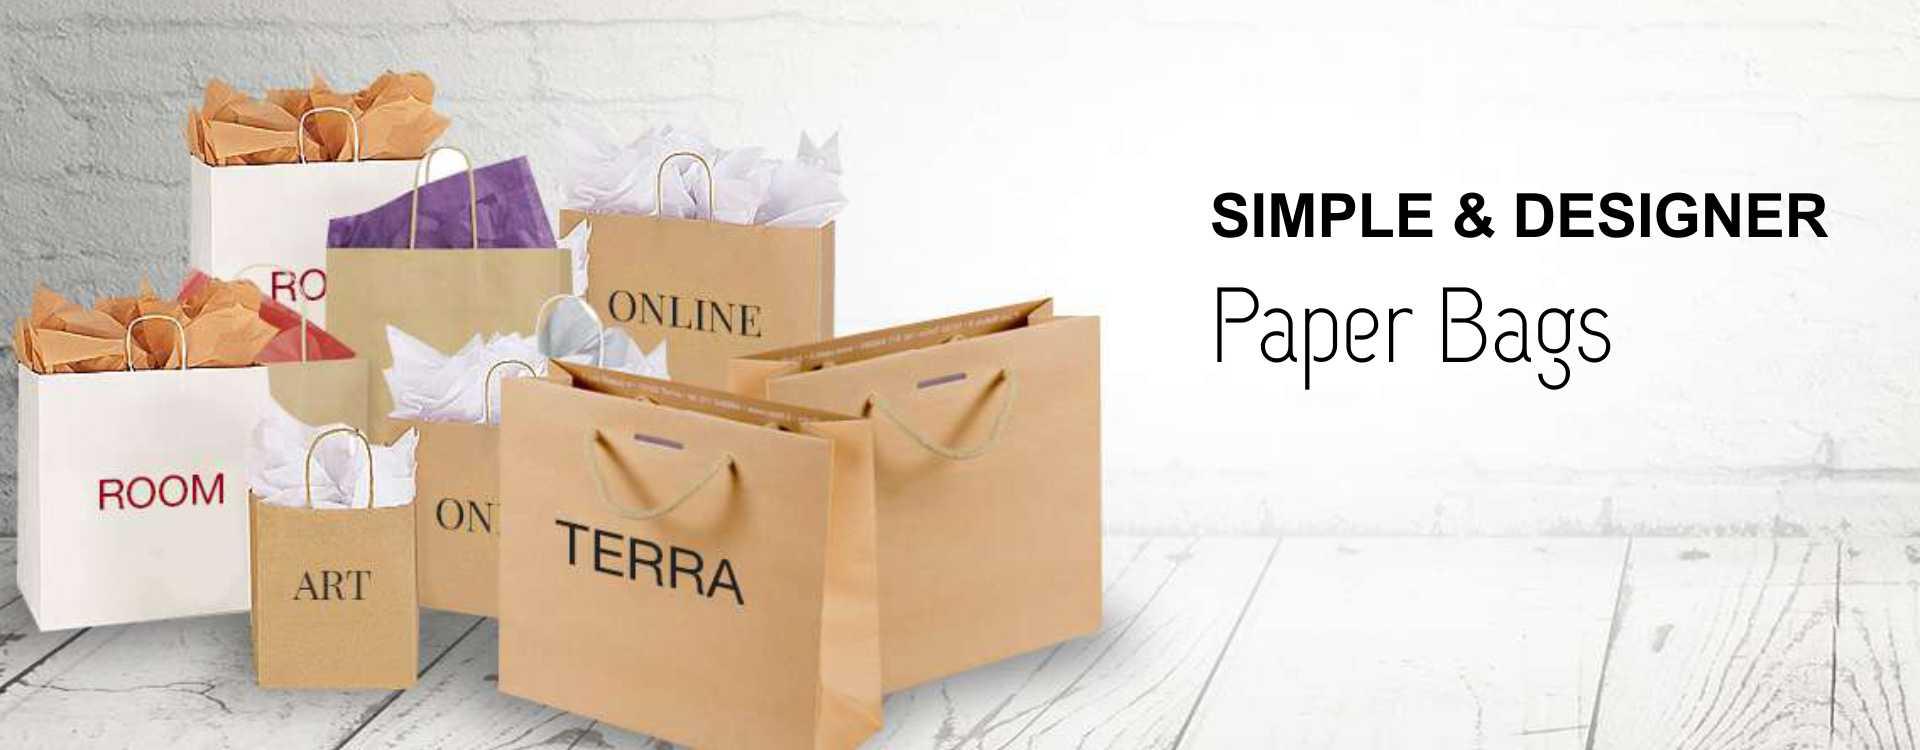 Paper Bag Manufacturers in india